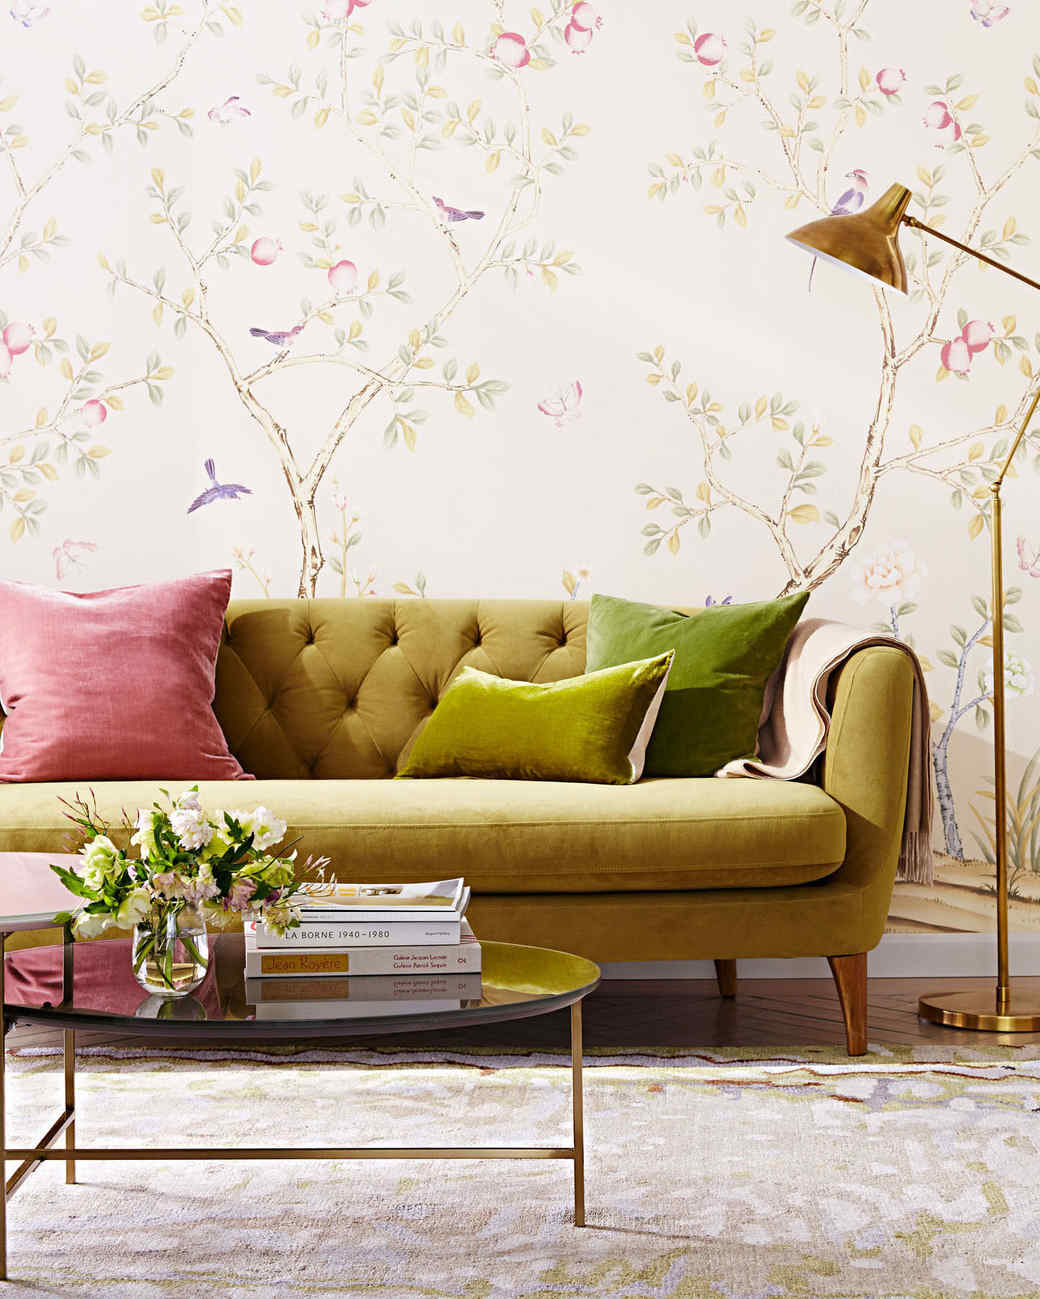 PeelOff Easy to Remove Wallpaper  Martha Stewart